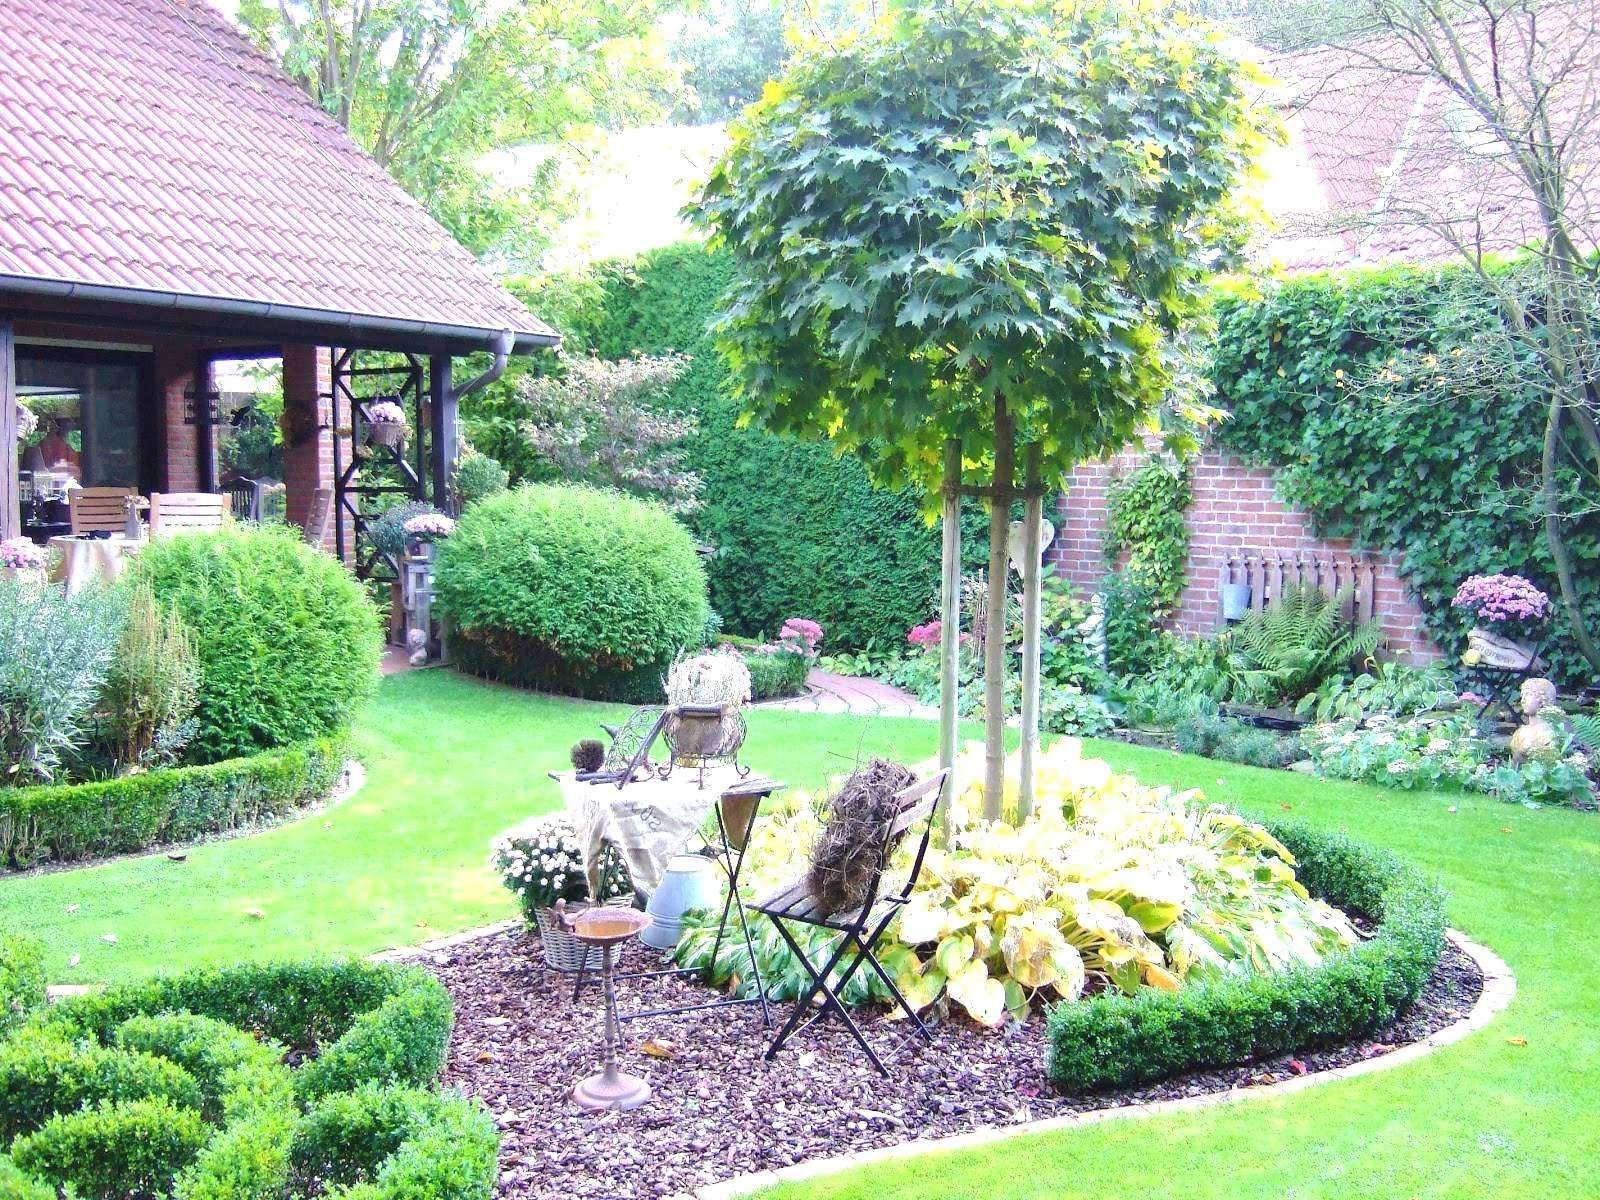 Garten Gestalten Elegant Garten Ideas Garten Anlegen Inspirational Aussenleuchten